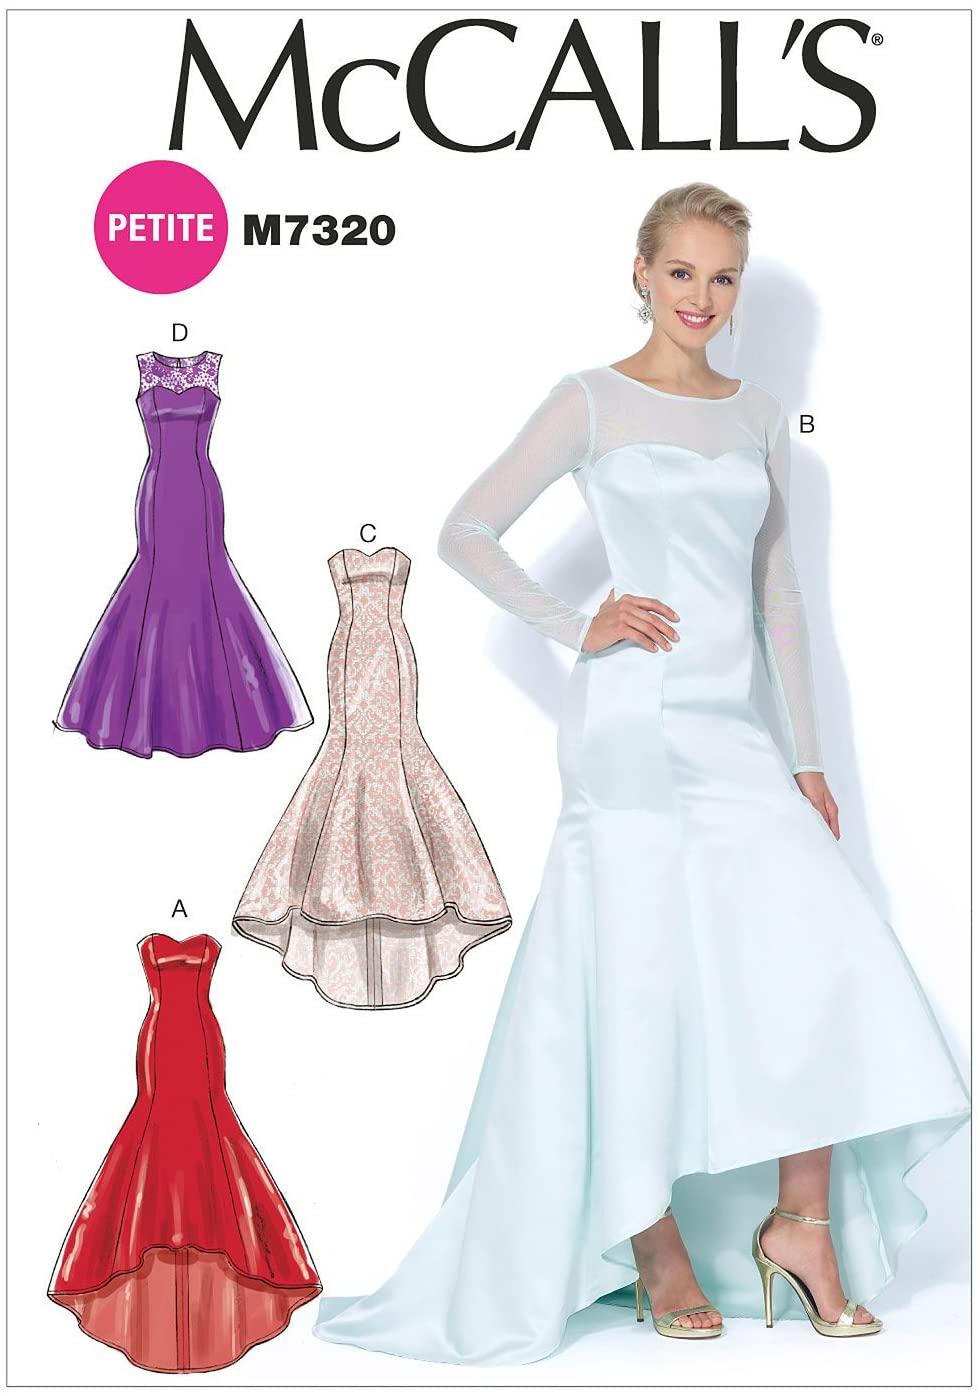 McCalls Patterns M7320 Misses/Miss Petite Mermaid-Hem and High-Low Dresses, Size E5 (14-16-18-20-22)